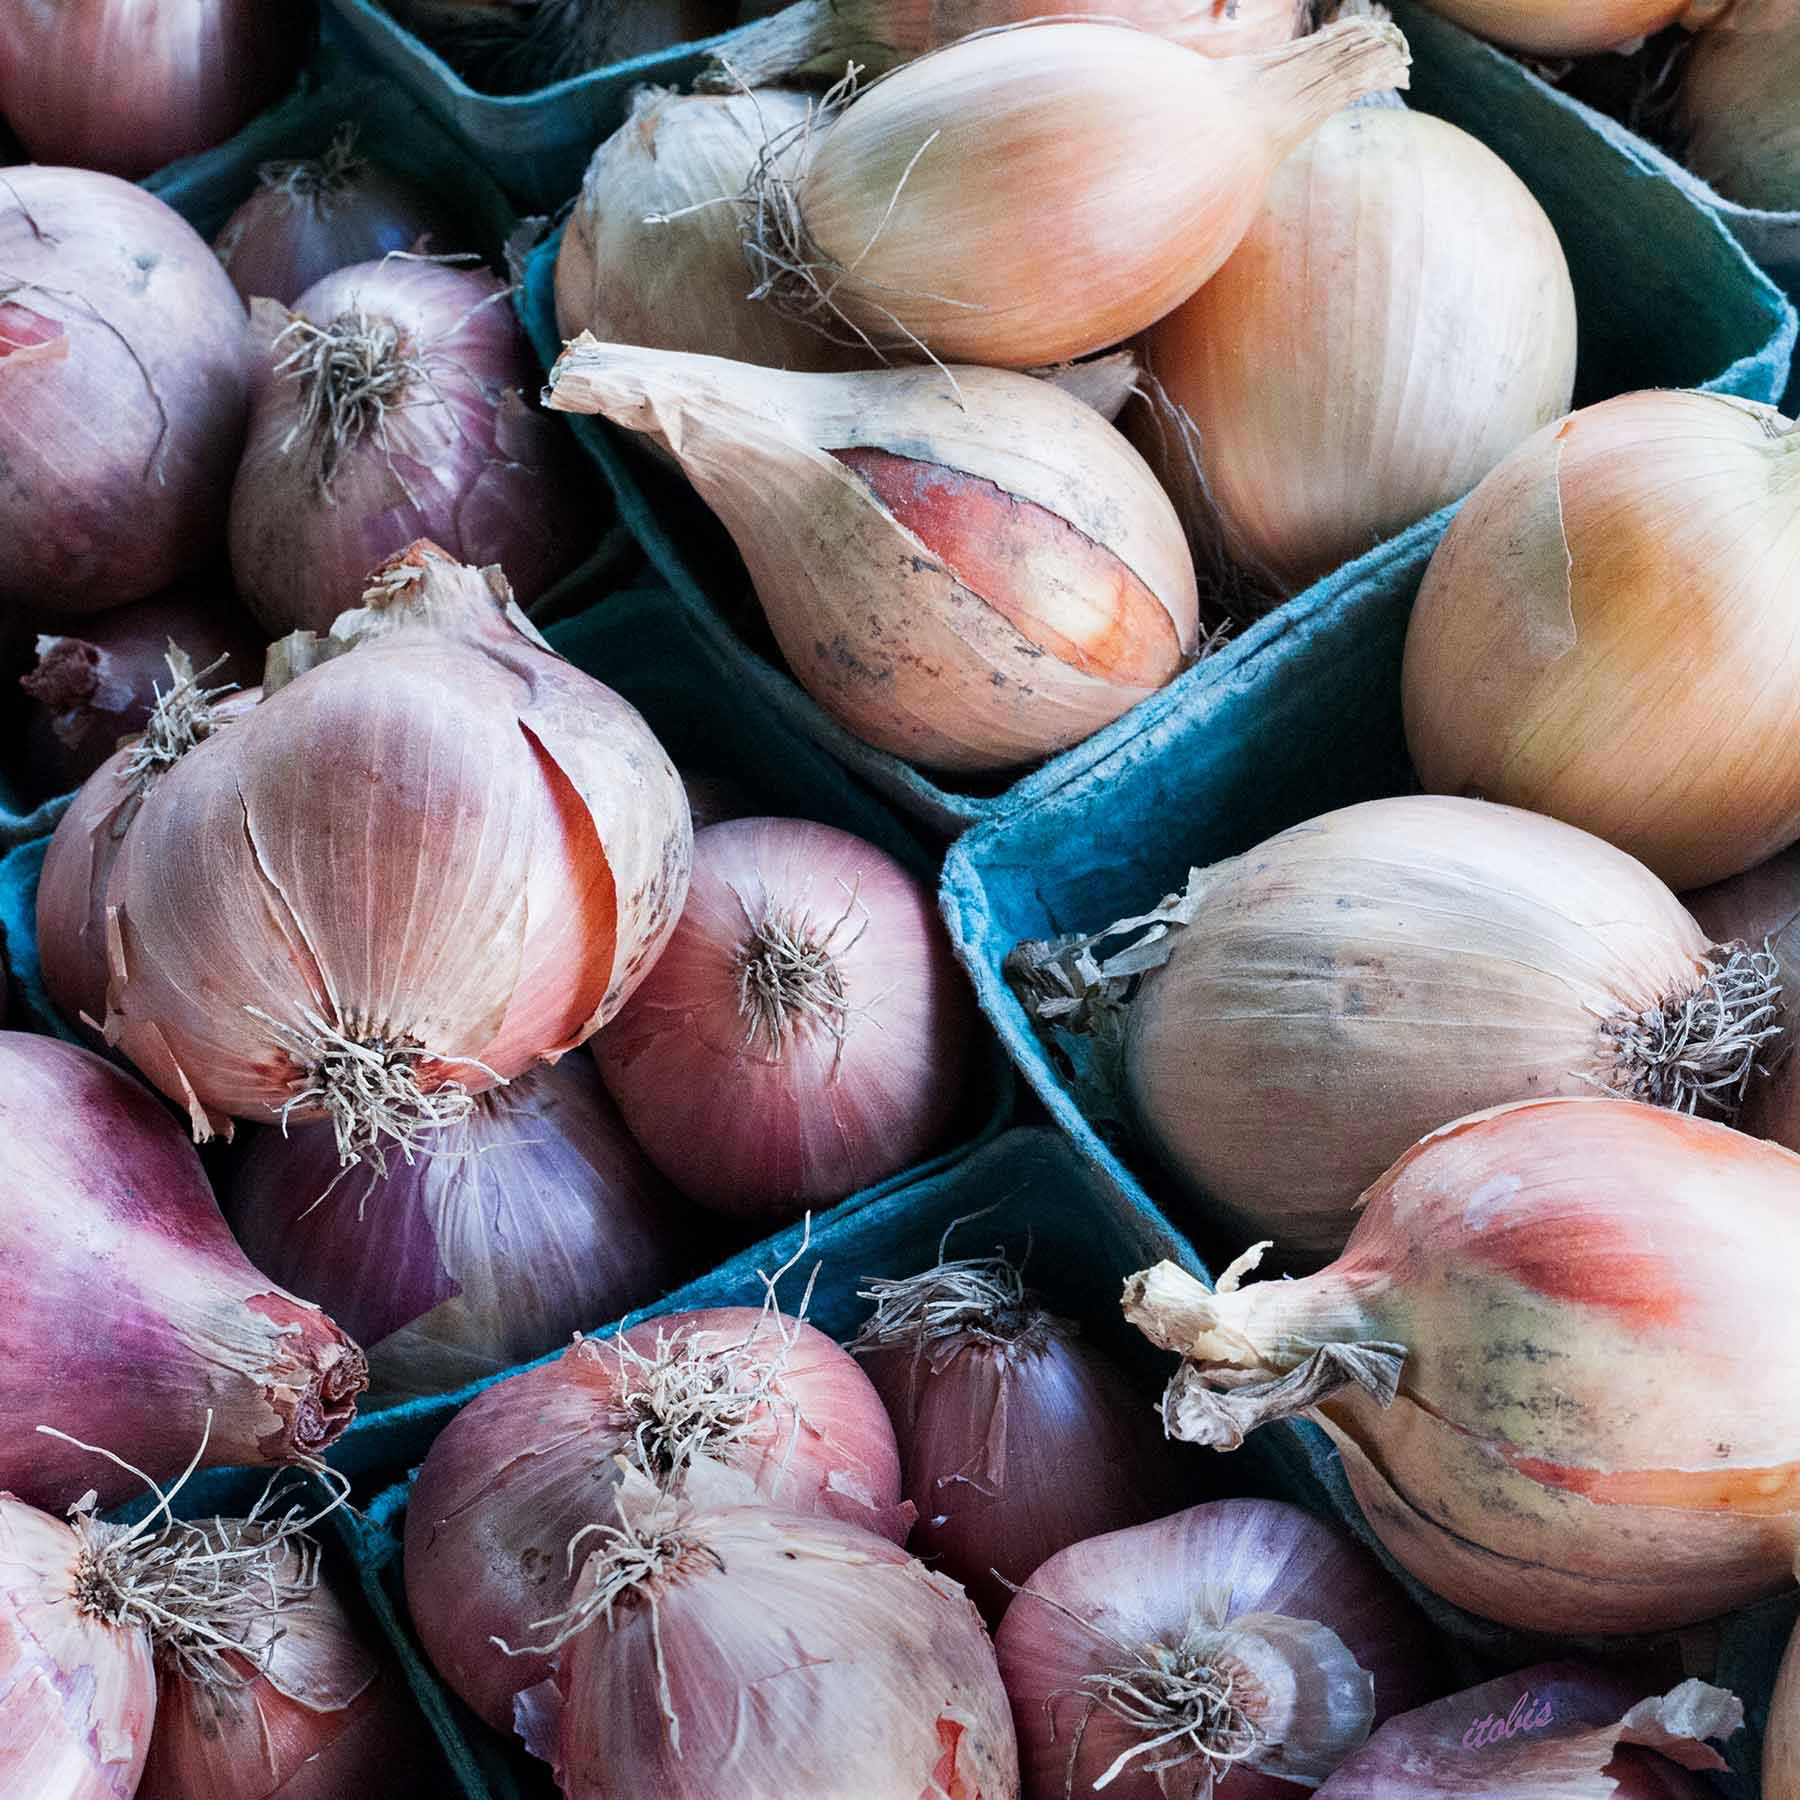 Shallots at the Market - Waratah Downs Organic Farm - Ottawa Farmers' Market, Lansdowne Park - photo by Irene Tobis